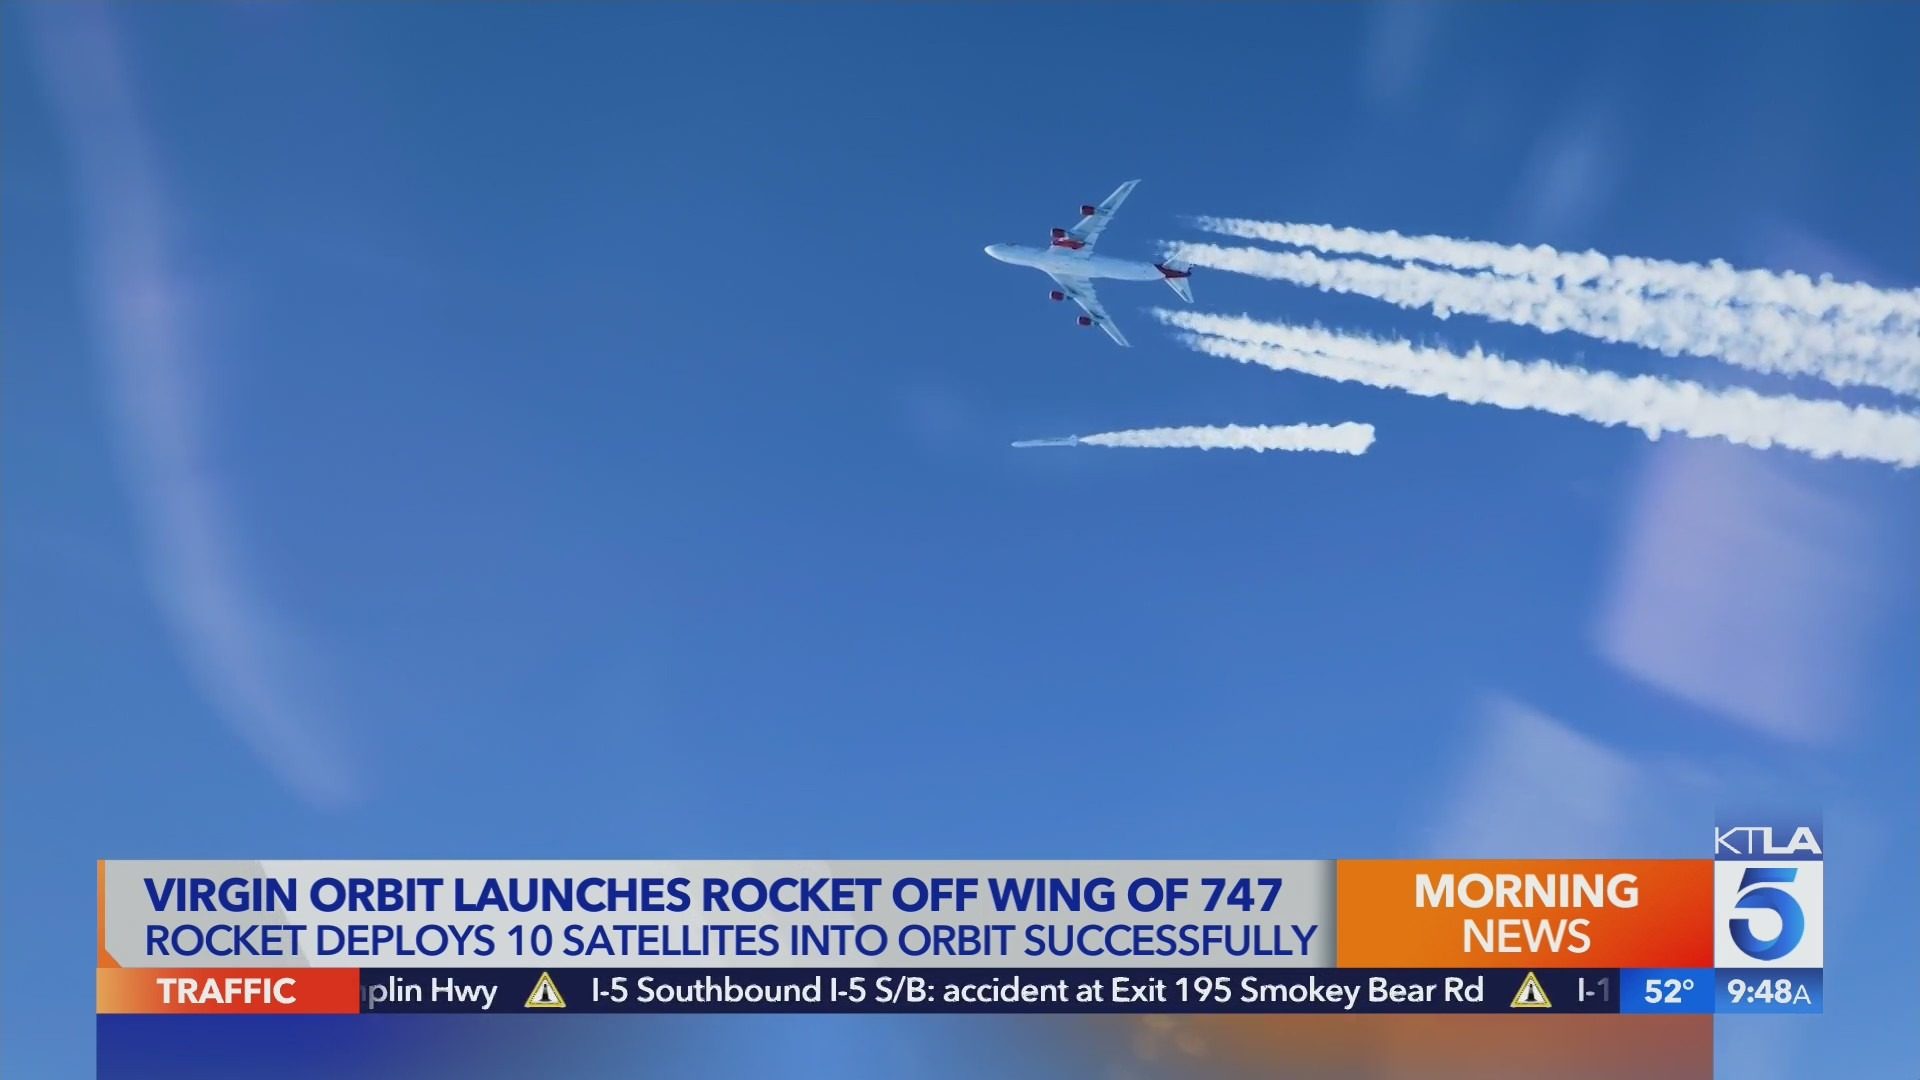 Chief Test Pilot Kelly Latimer Virgin Orbit rocket launch